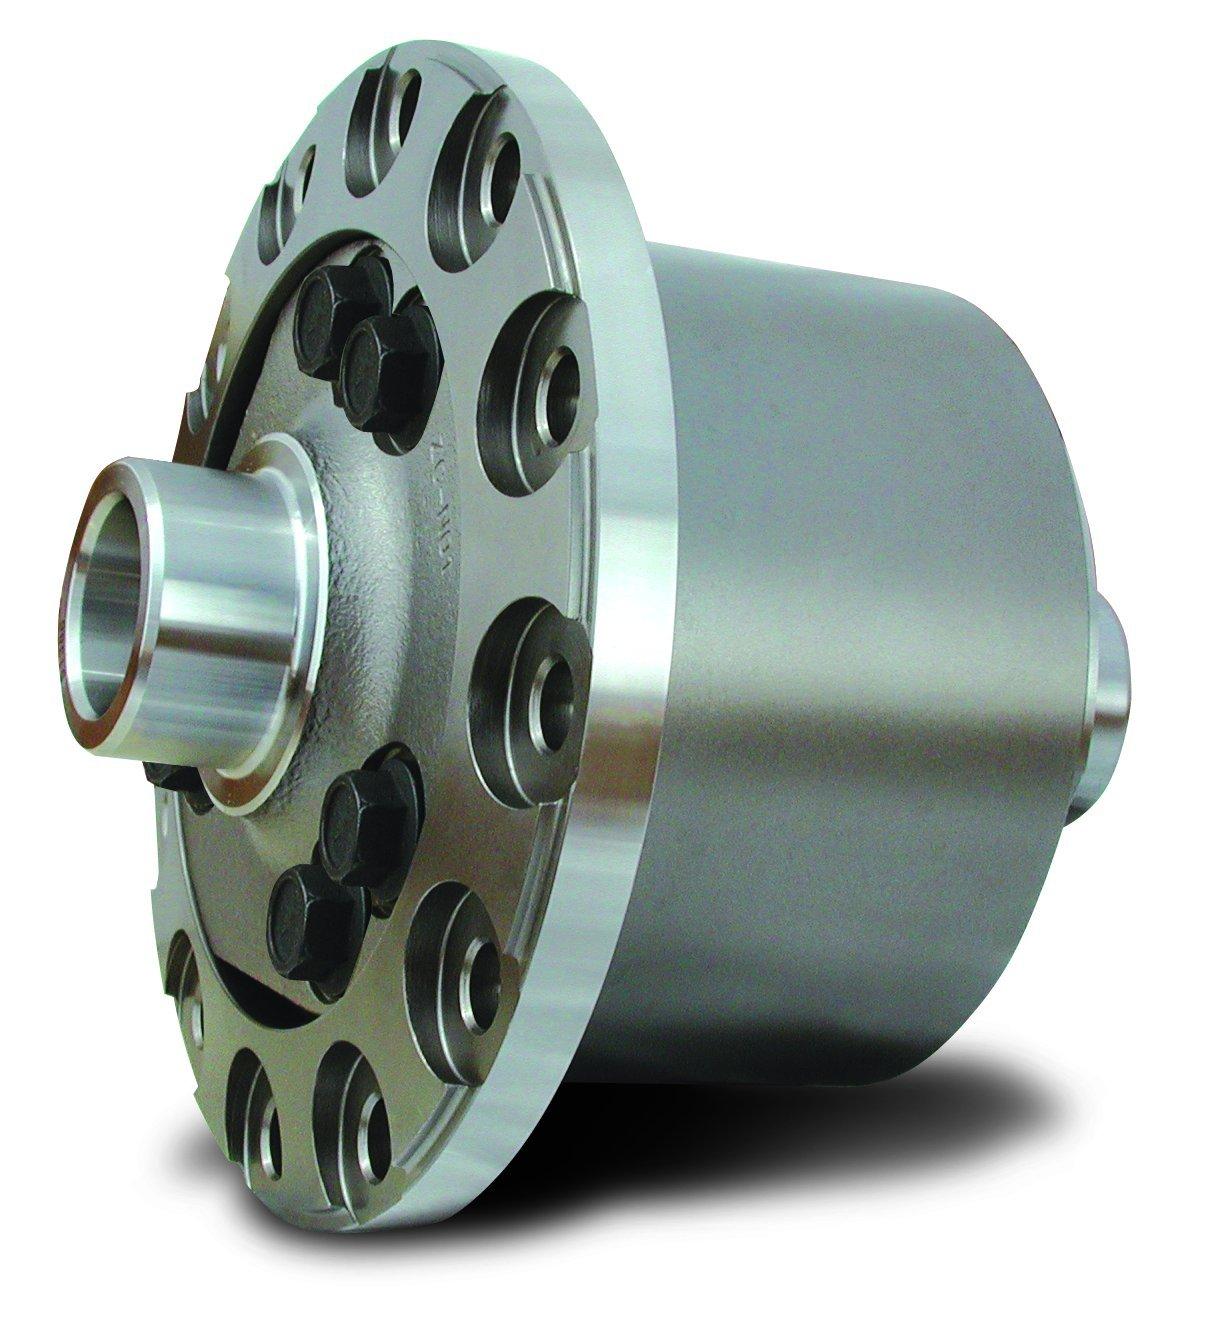 CMA Dish Machines 13503.60 Power Rinse Pump Assembly 1Ph 208